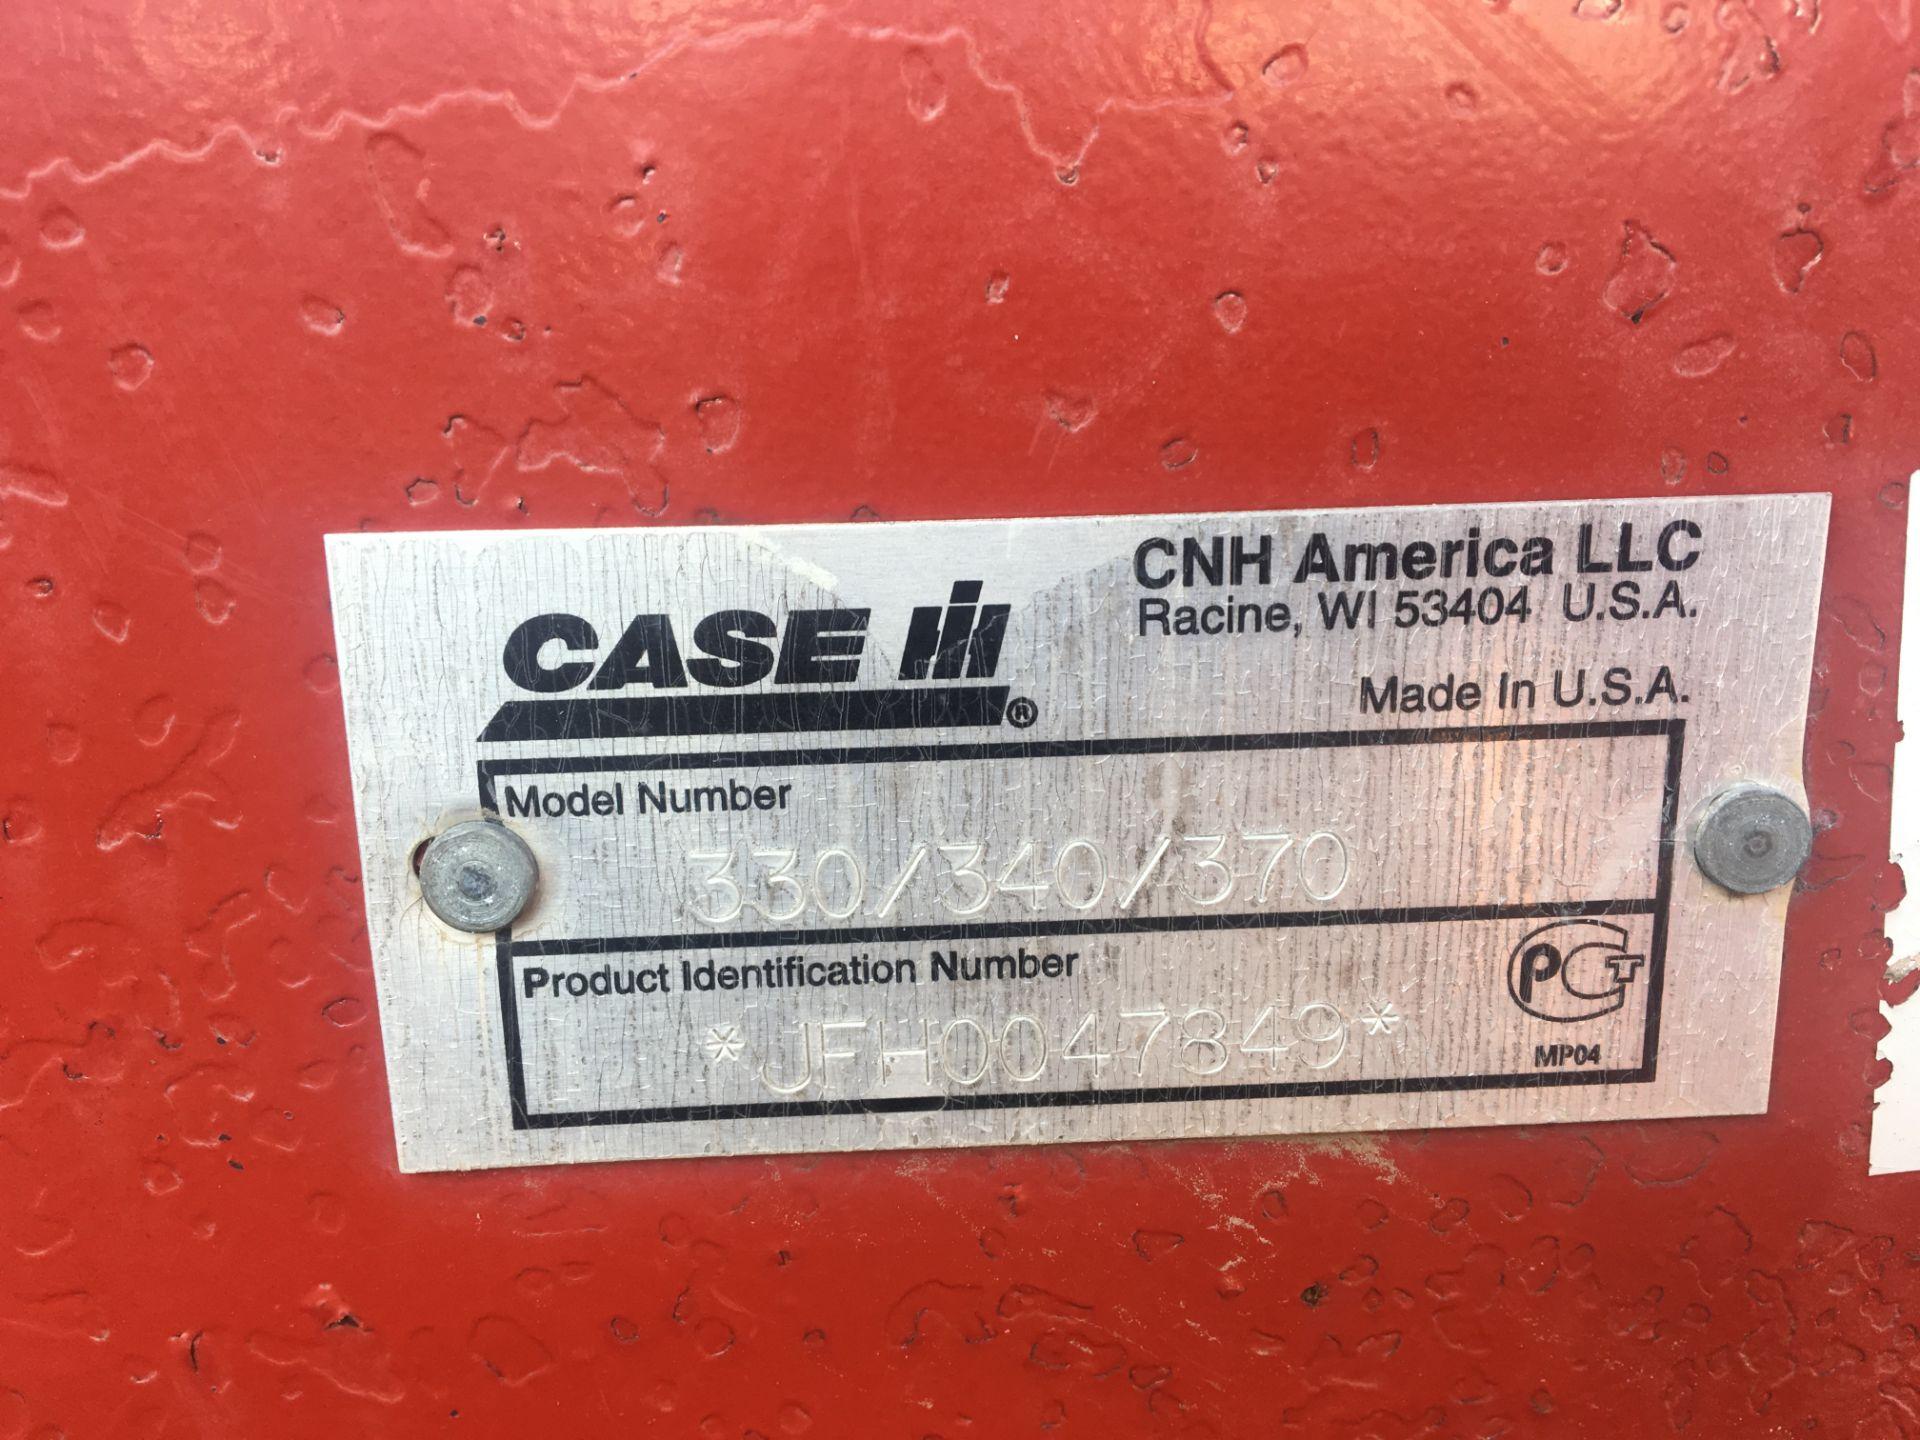 Lot 5 - 2011 Case IH 340, 26' Tandem Axle Disk